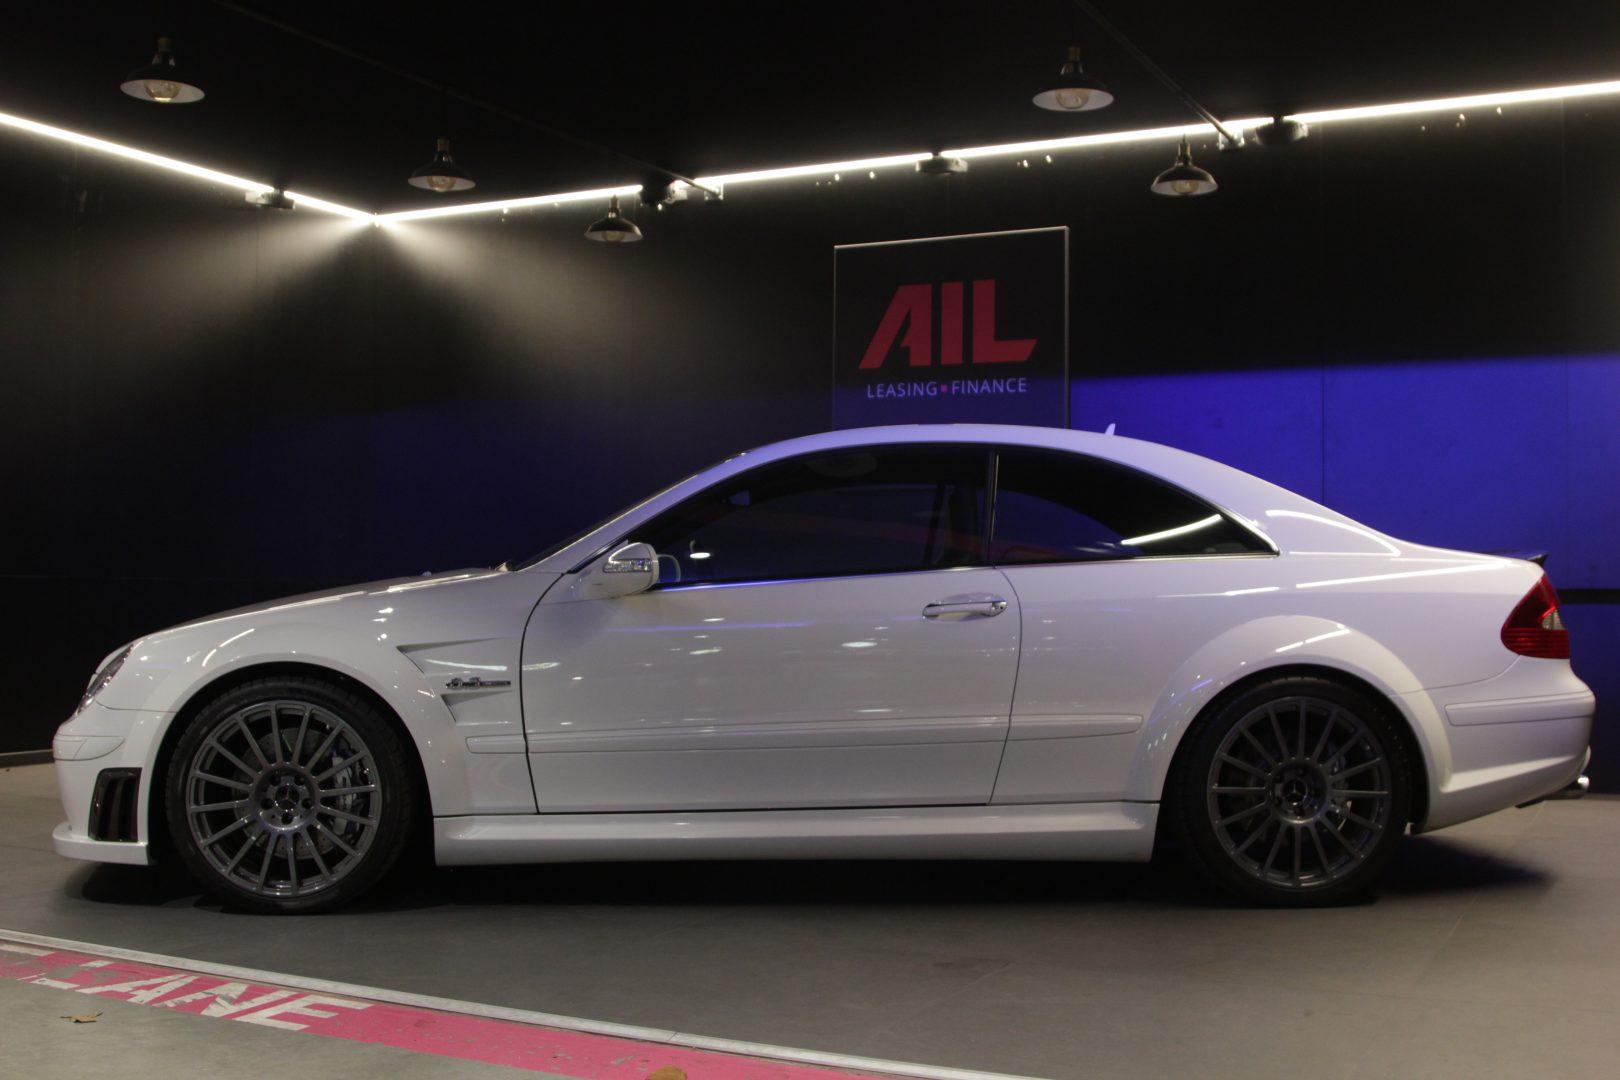 AIL Mercedes-Benz CLK 63 AMG Black Series 8